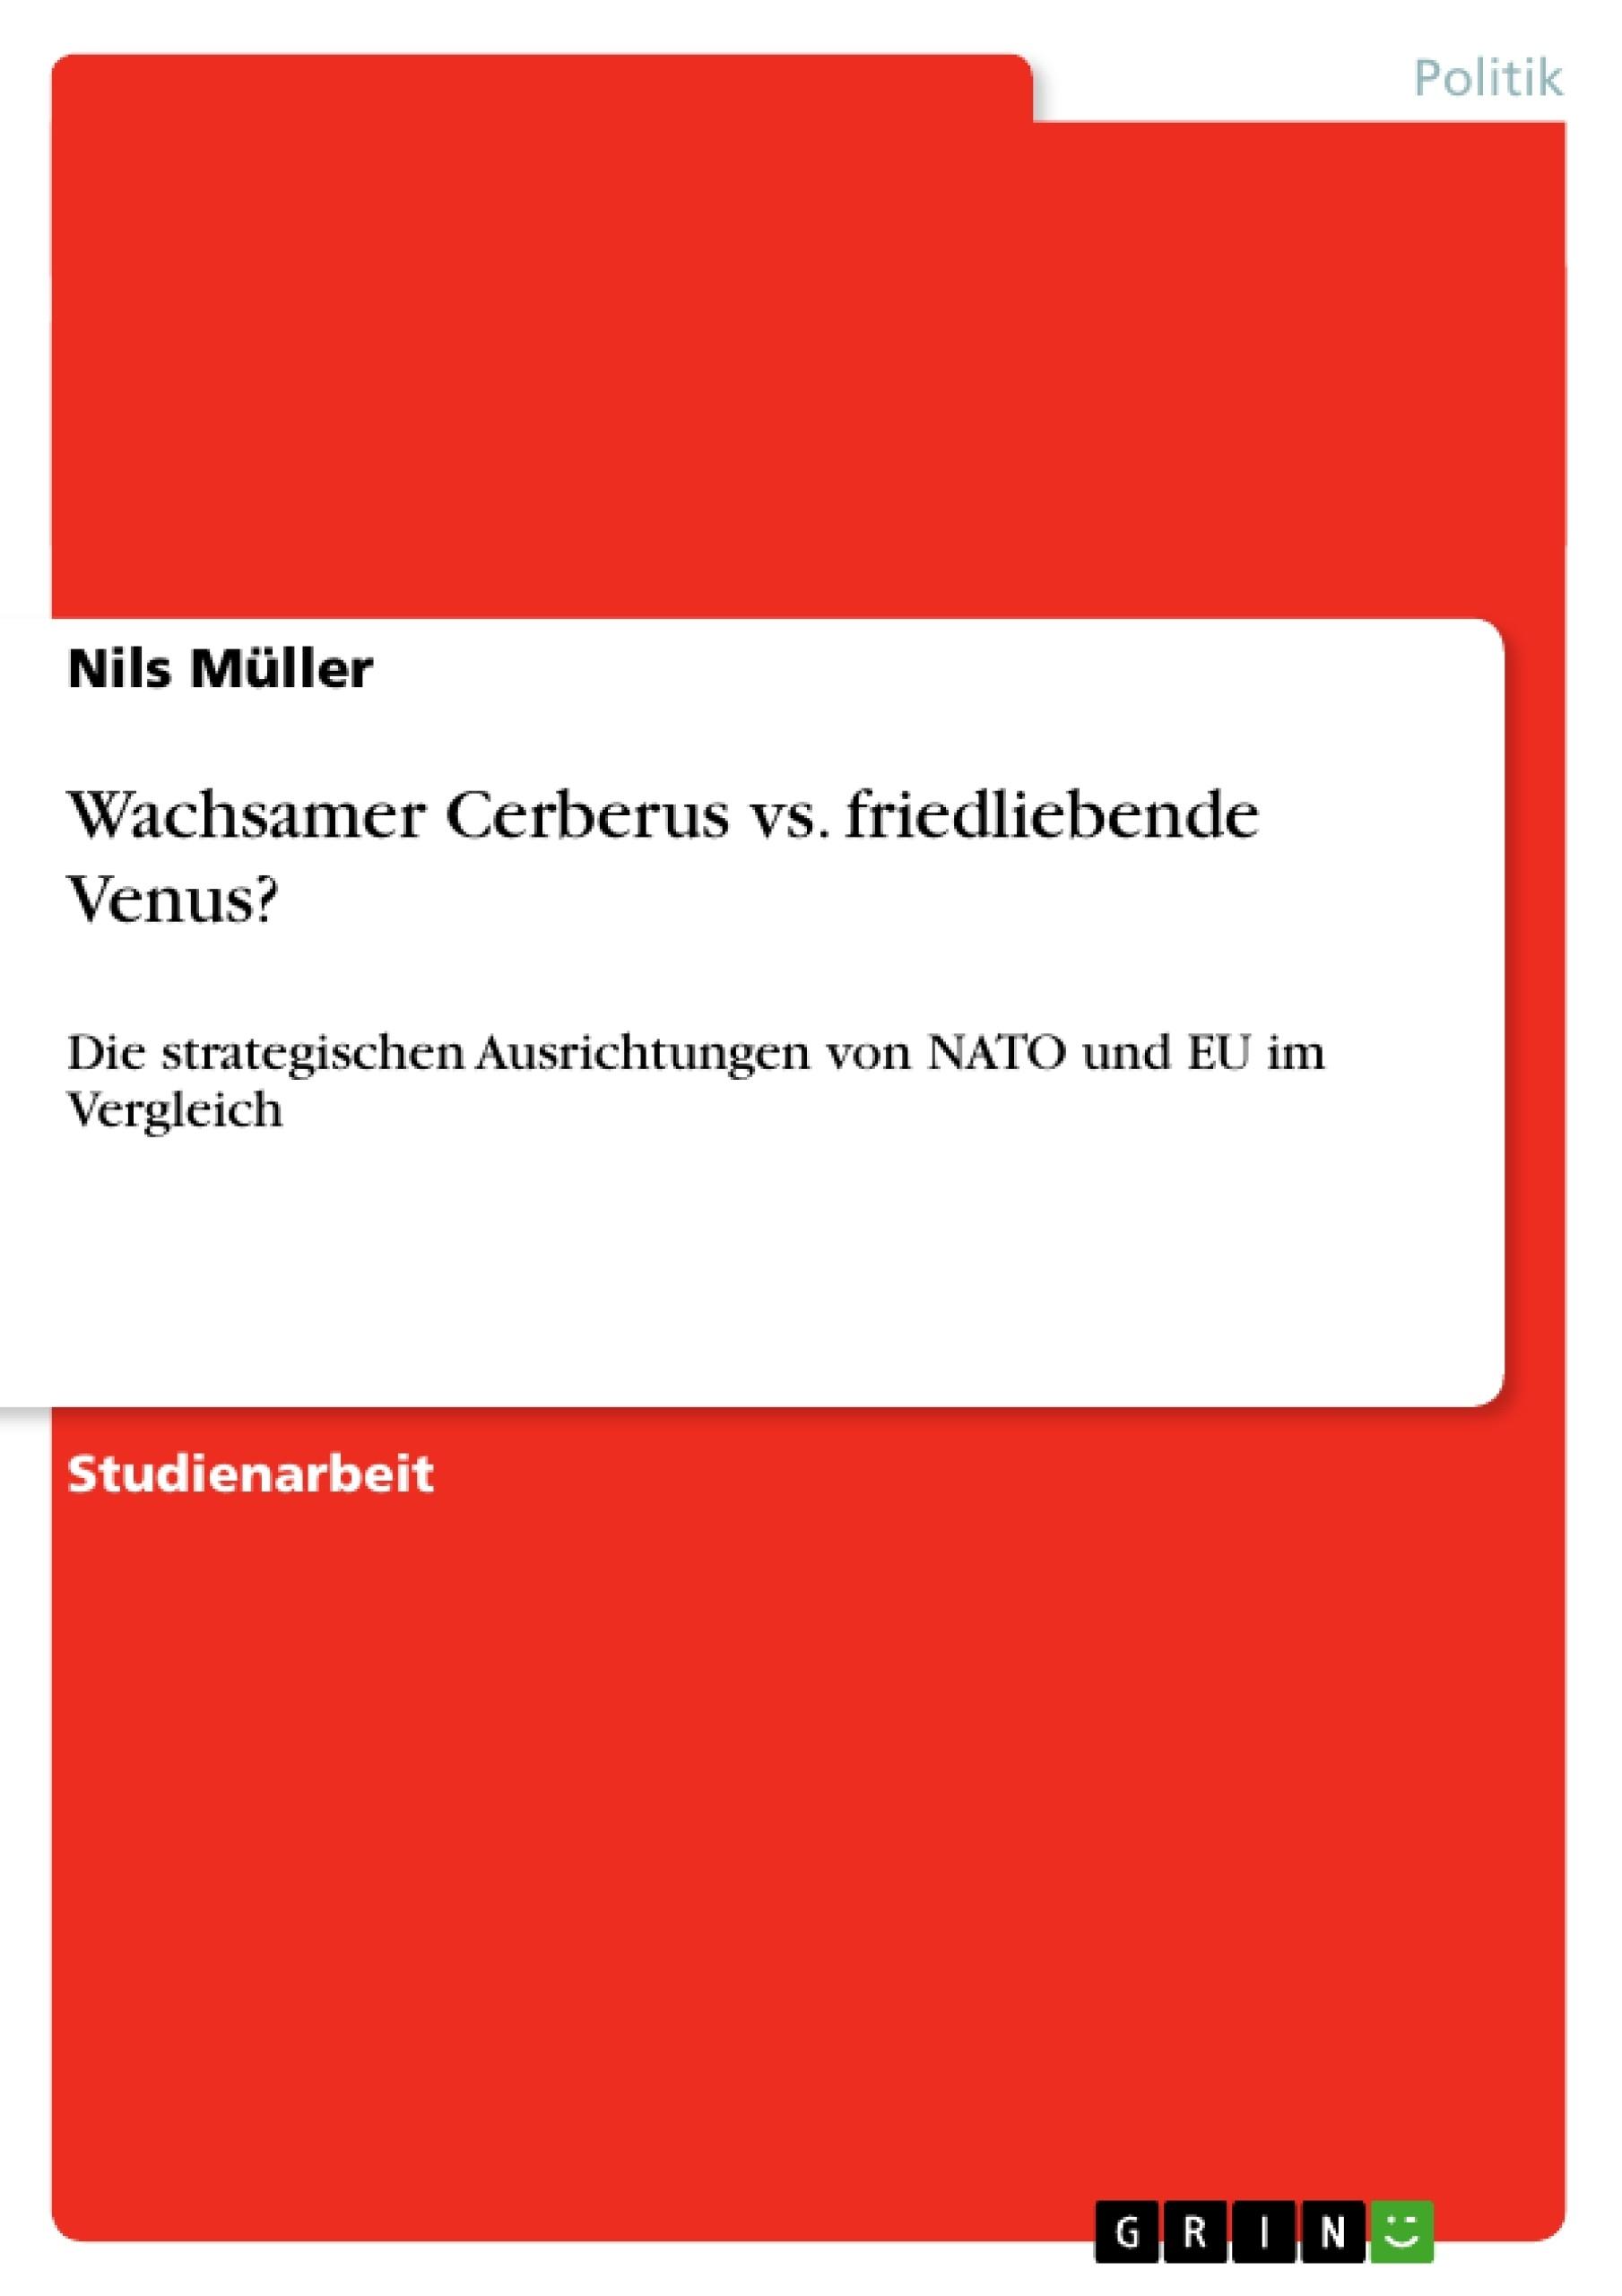 Titel: Wachsamer Cerberus vs. friedliebende Venus?